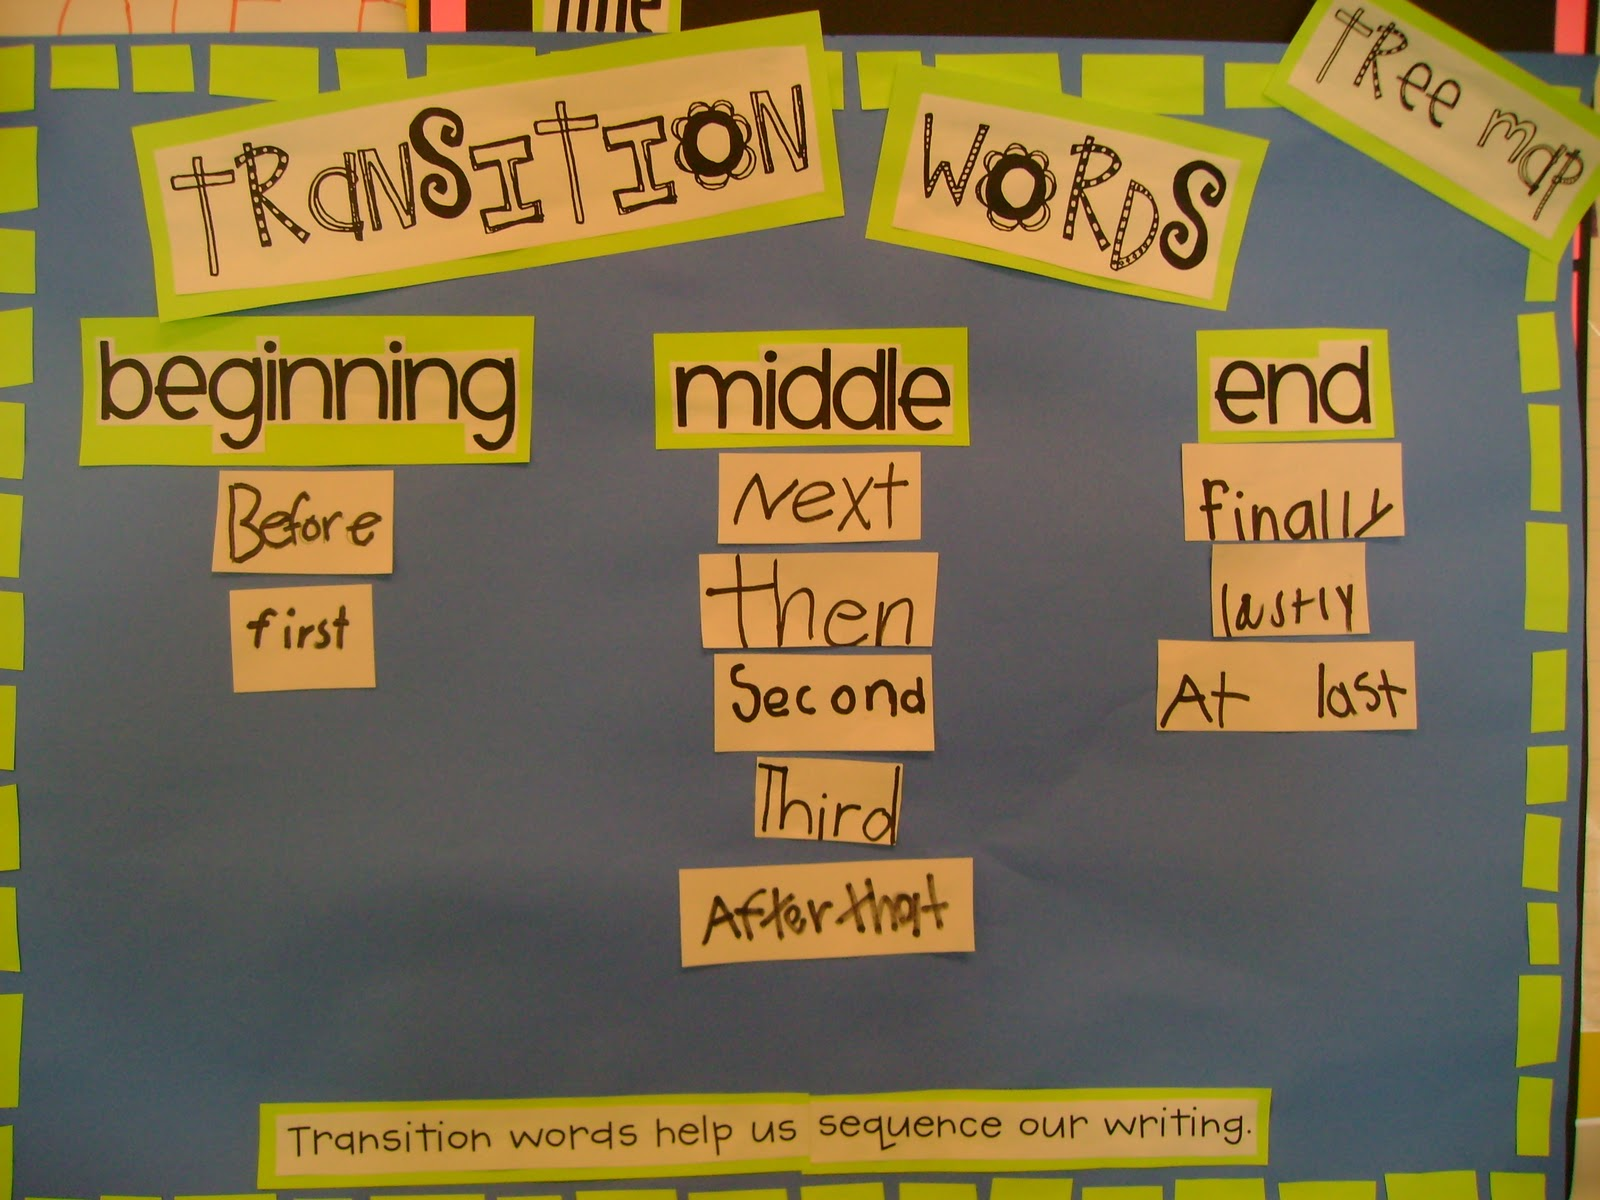 Beggining words for essays